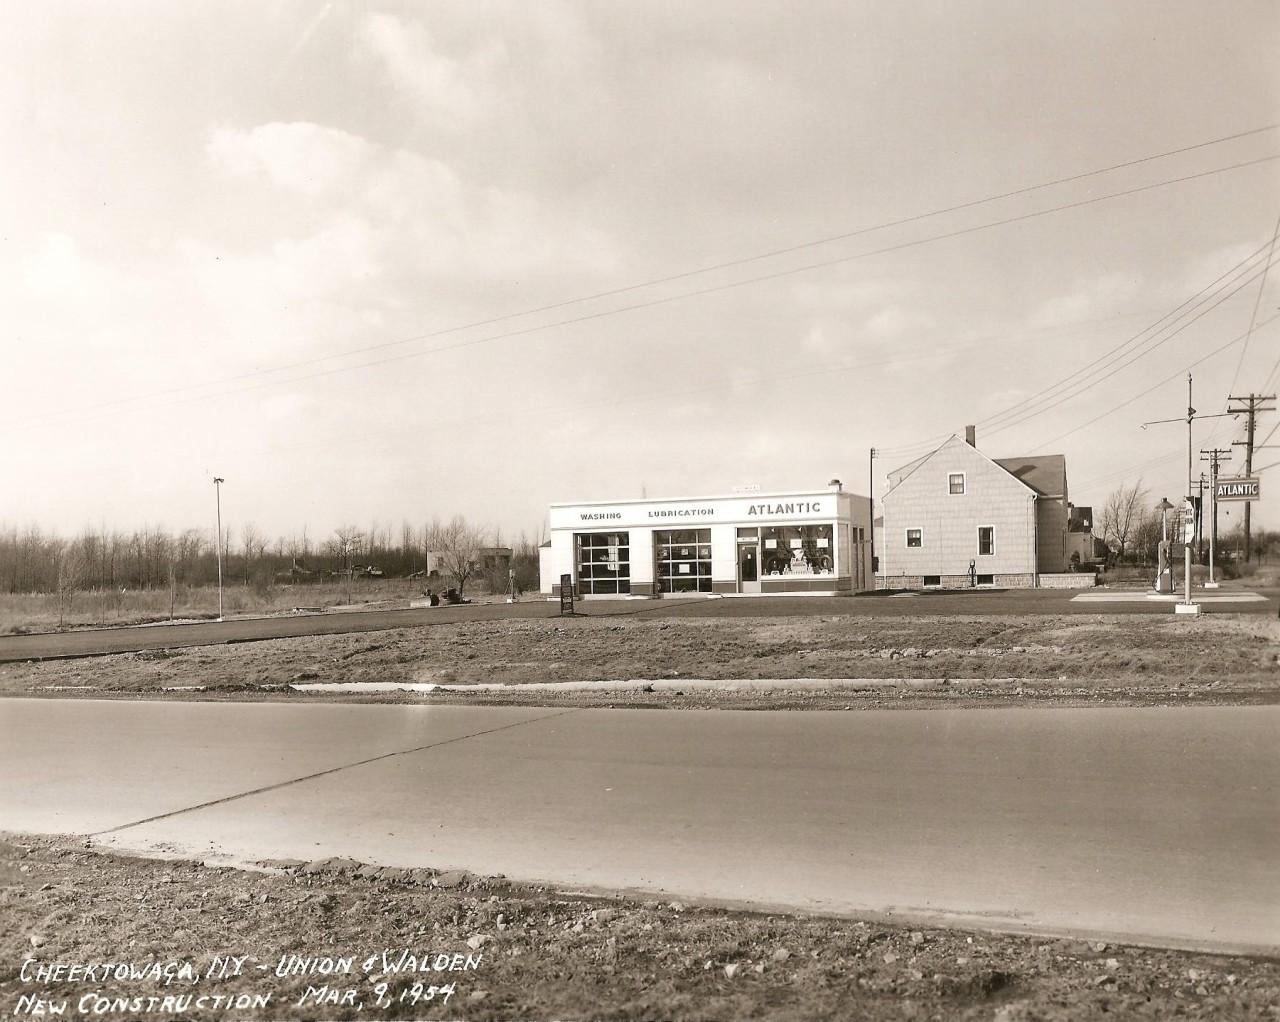 Walden & Union March 9, 1955